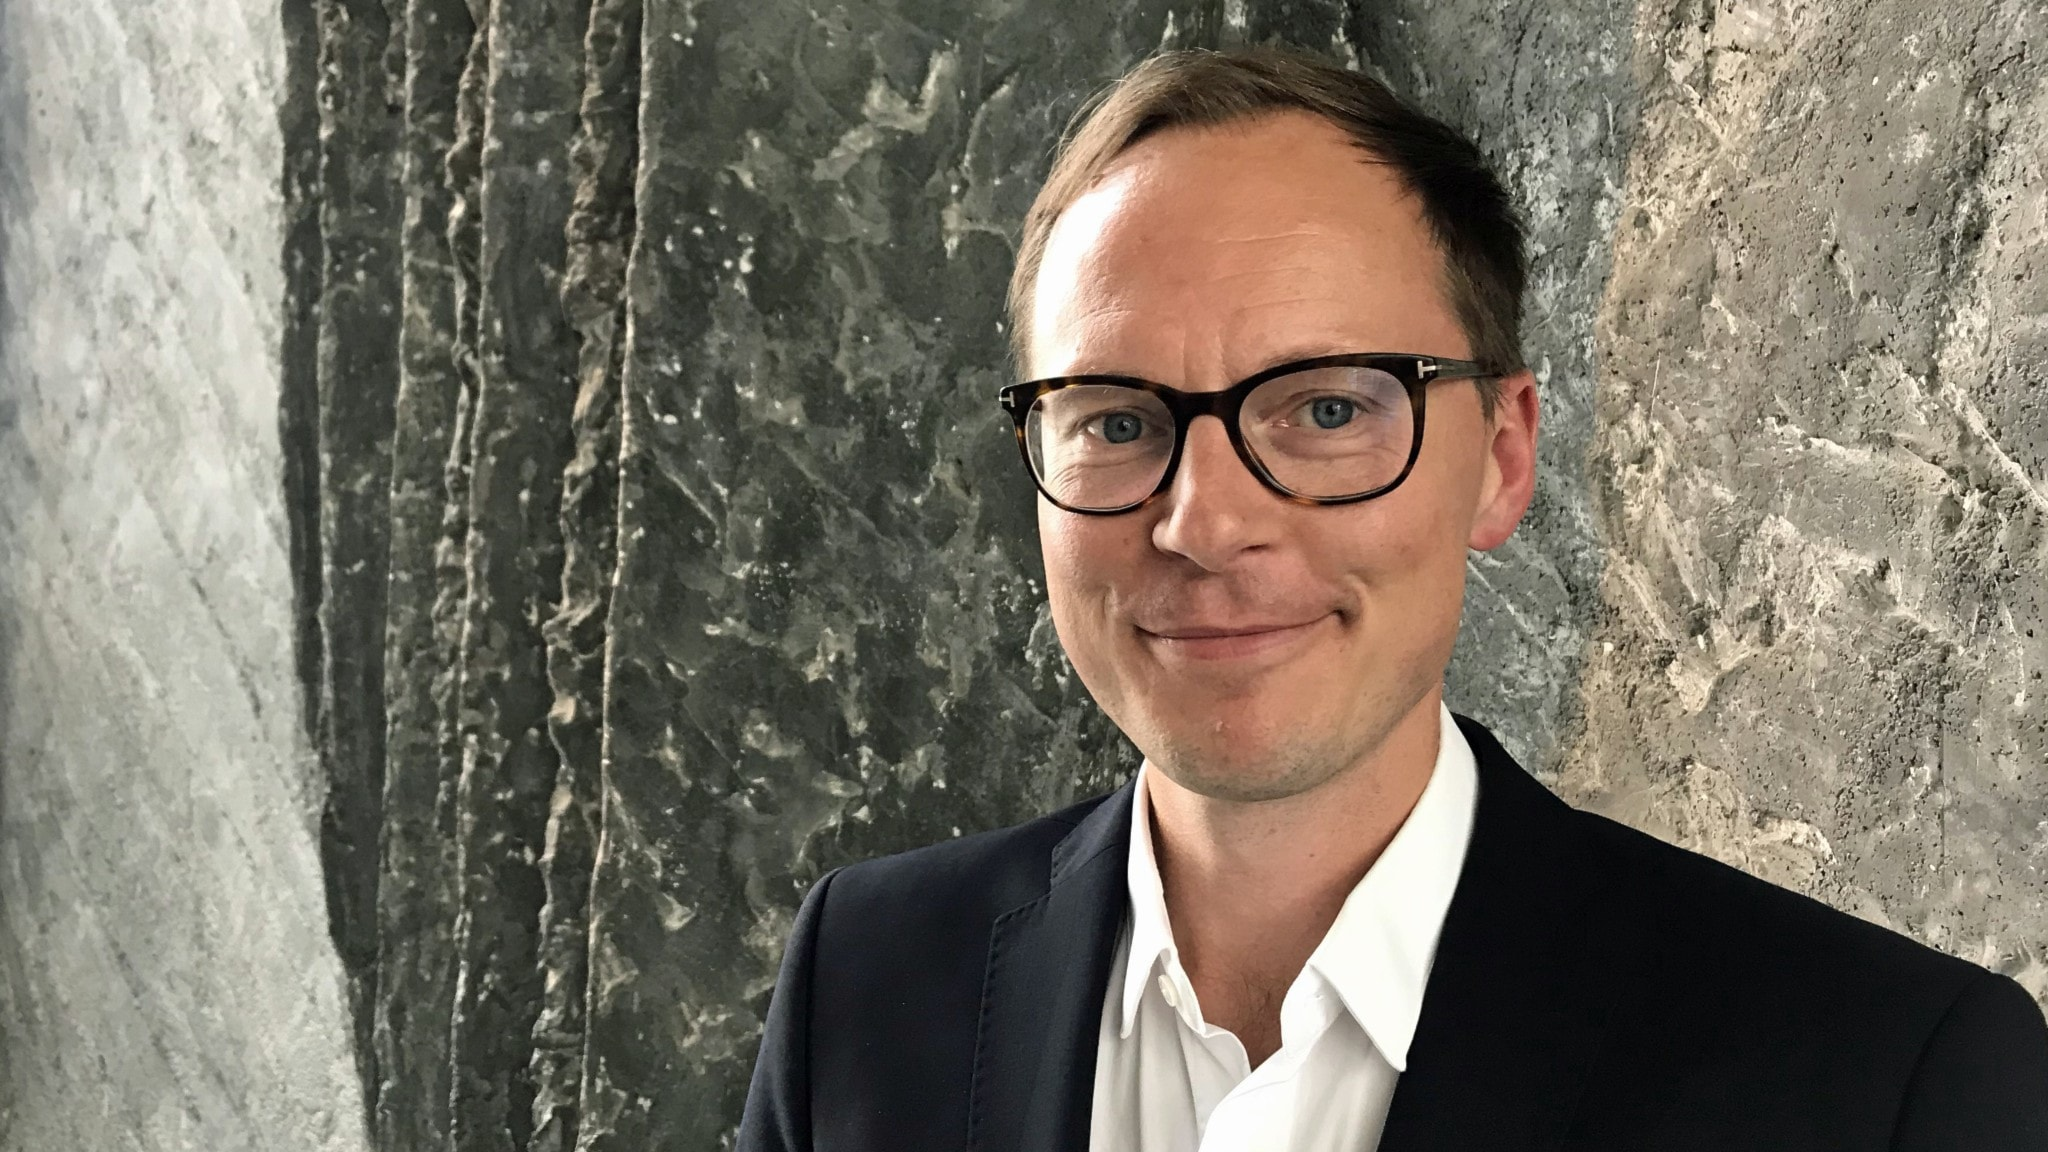 Var skaver regeringssamarbetet mest, Mats Persson (L)?